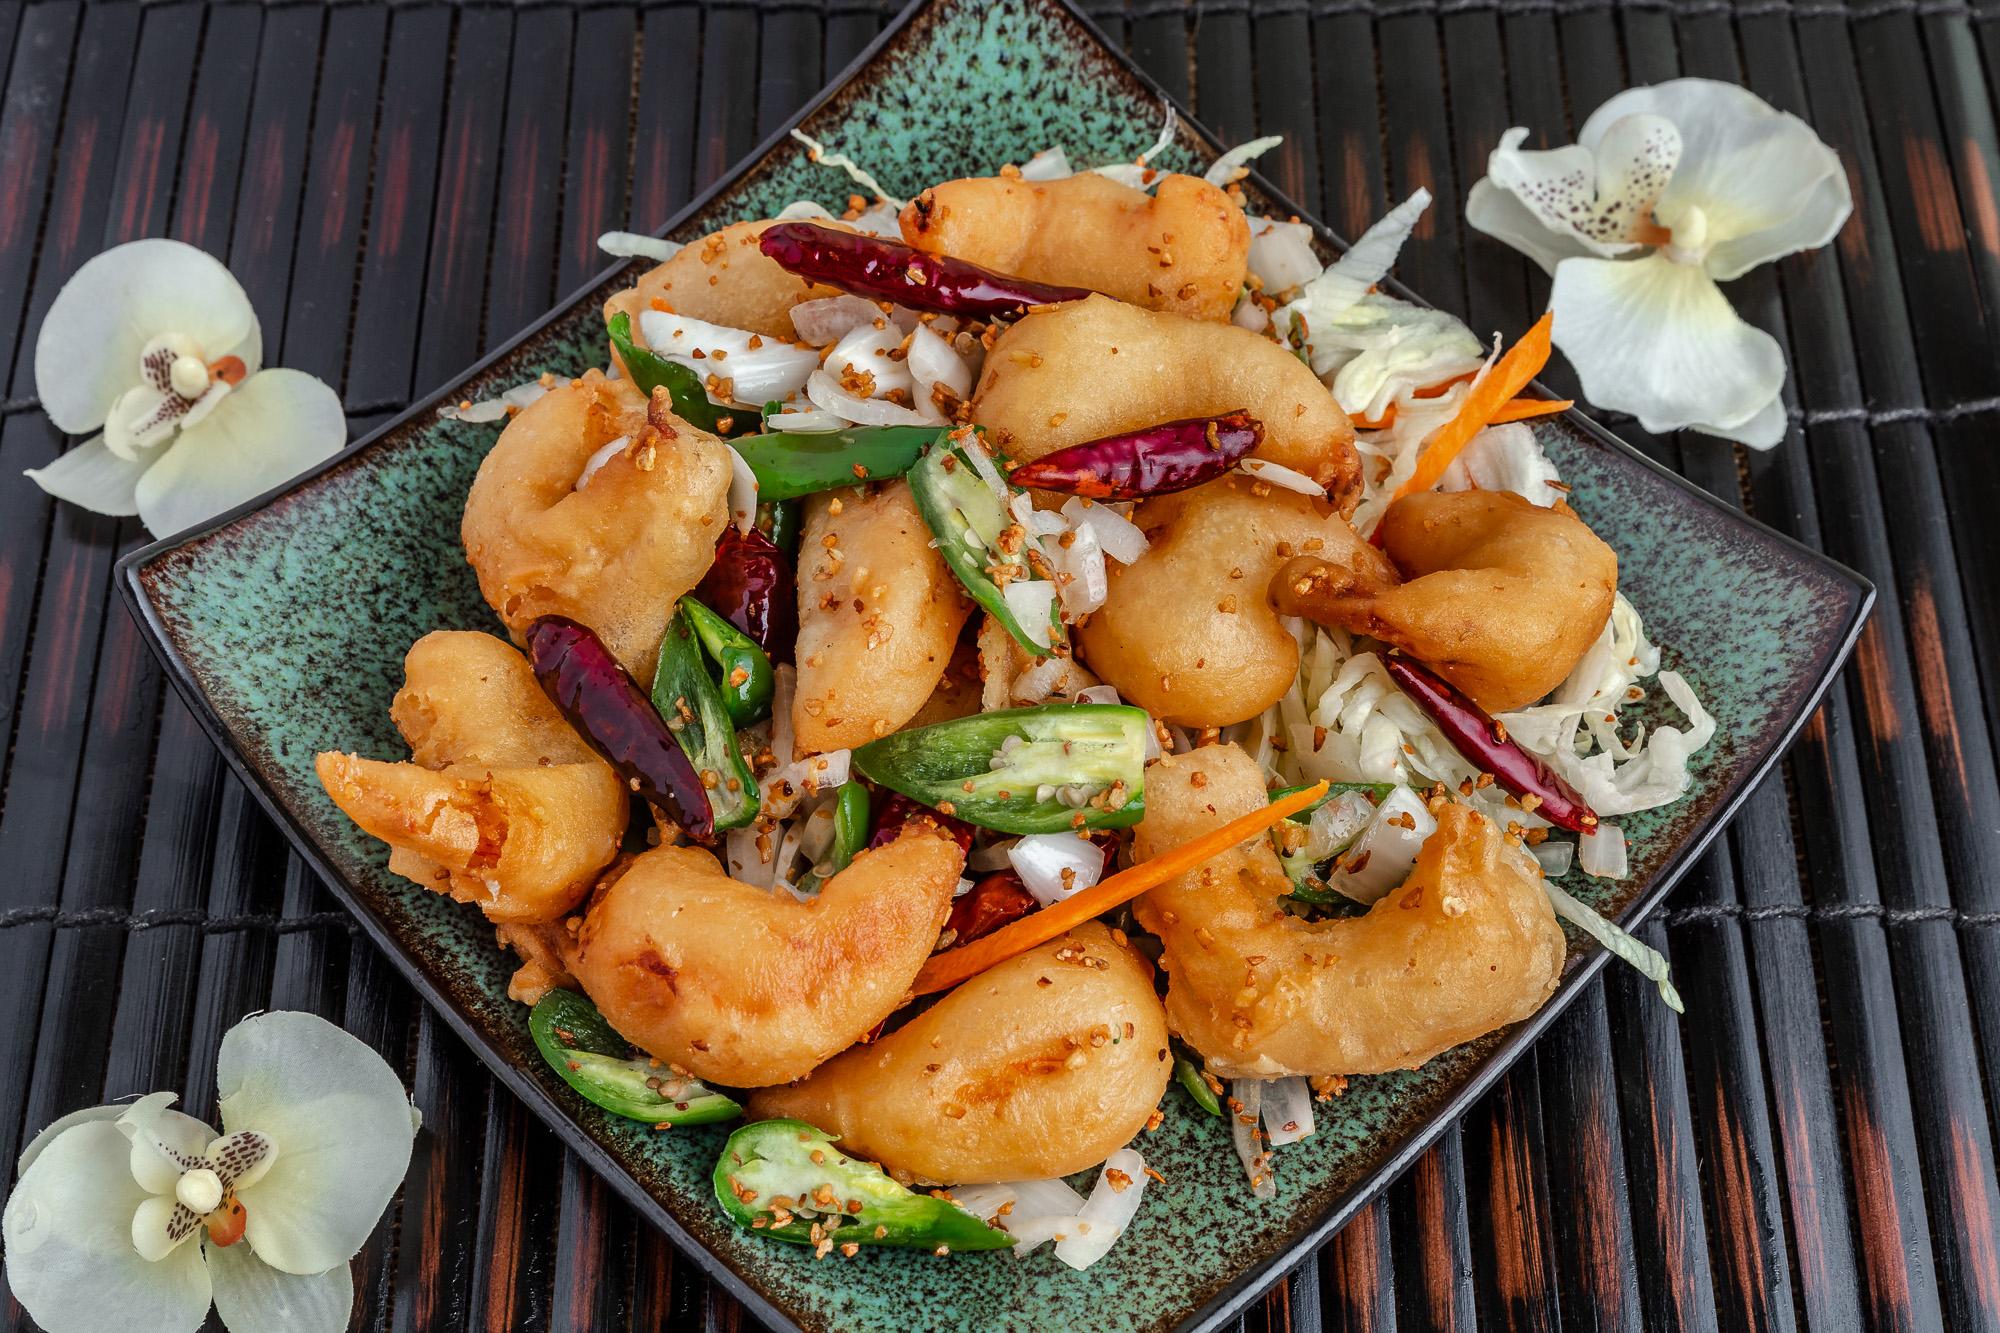 Salt & Pepper Shrimp Image